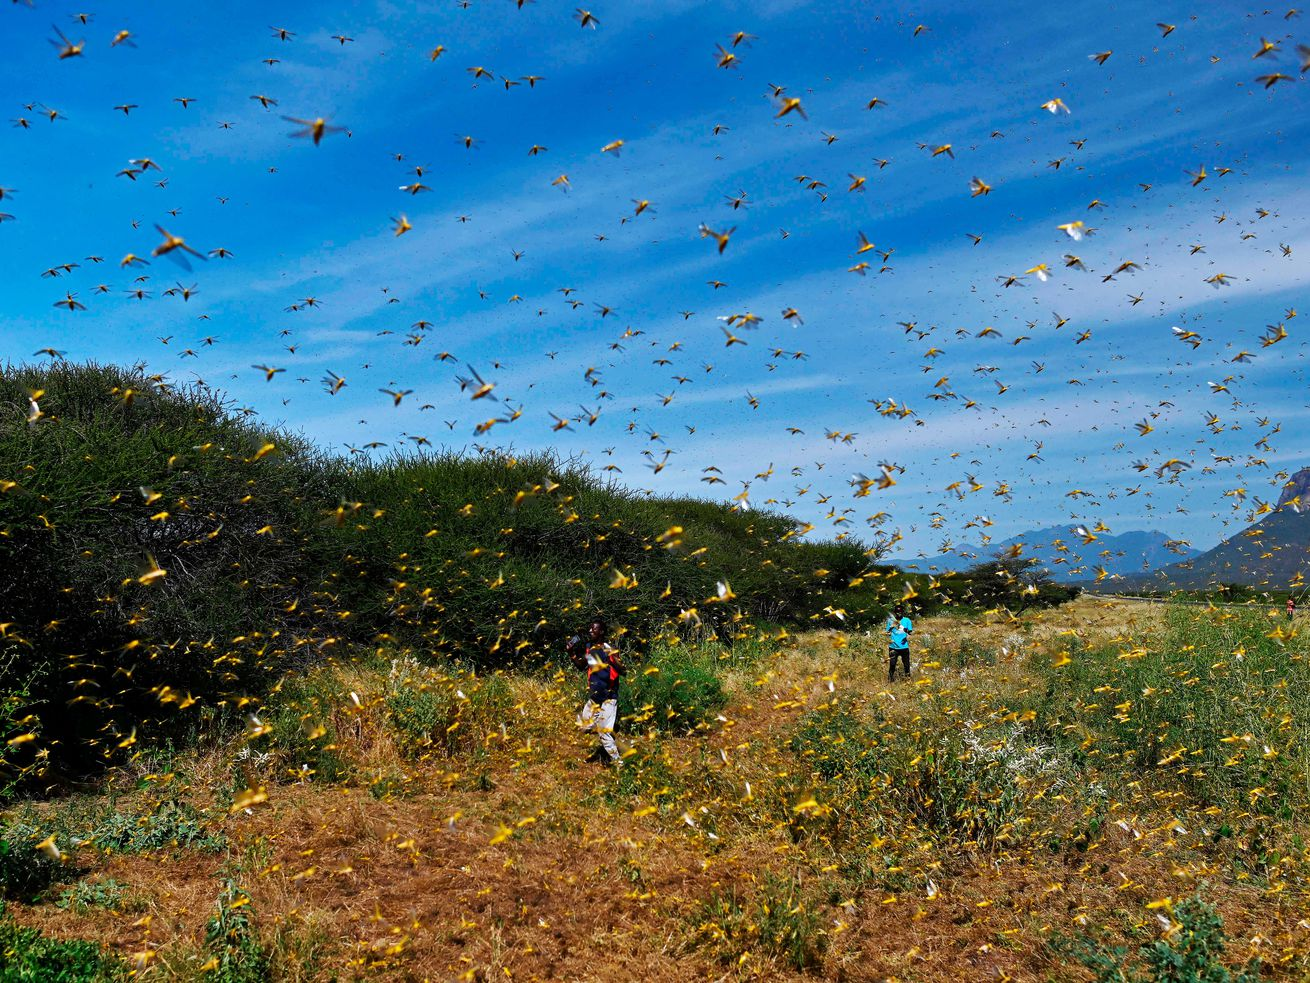 Locusts swarm from ground vegetation in Kenya